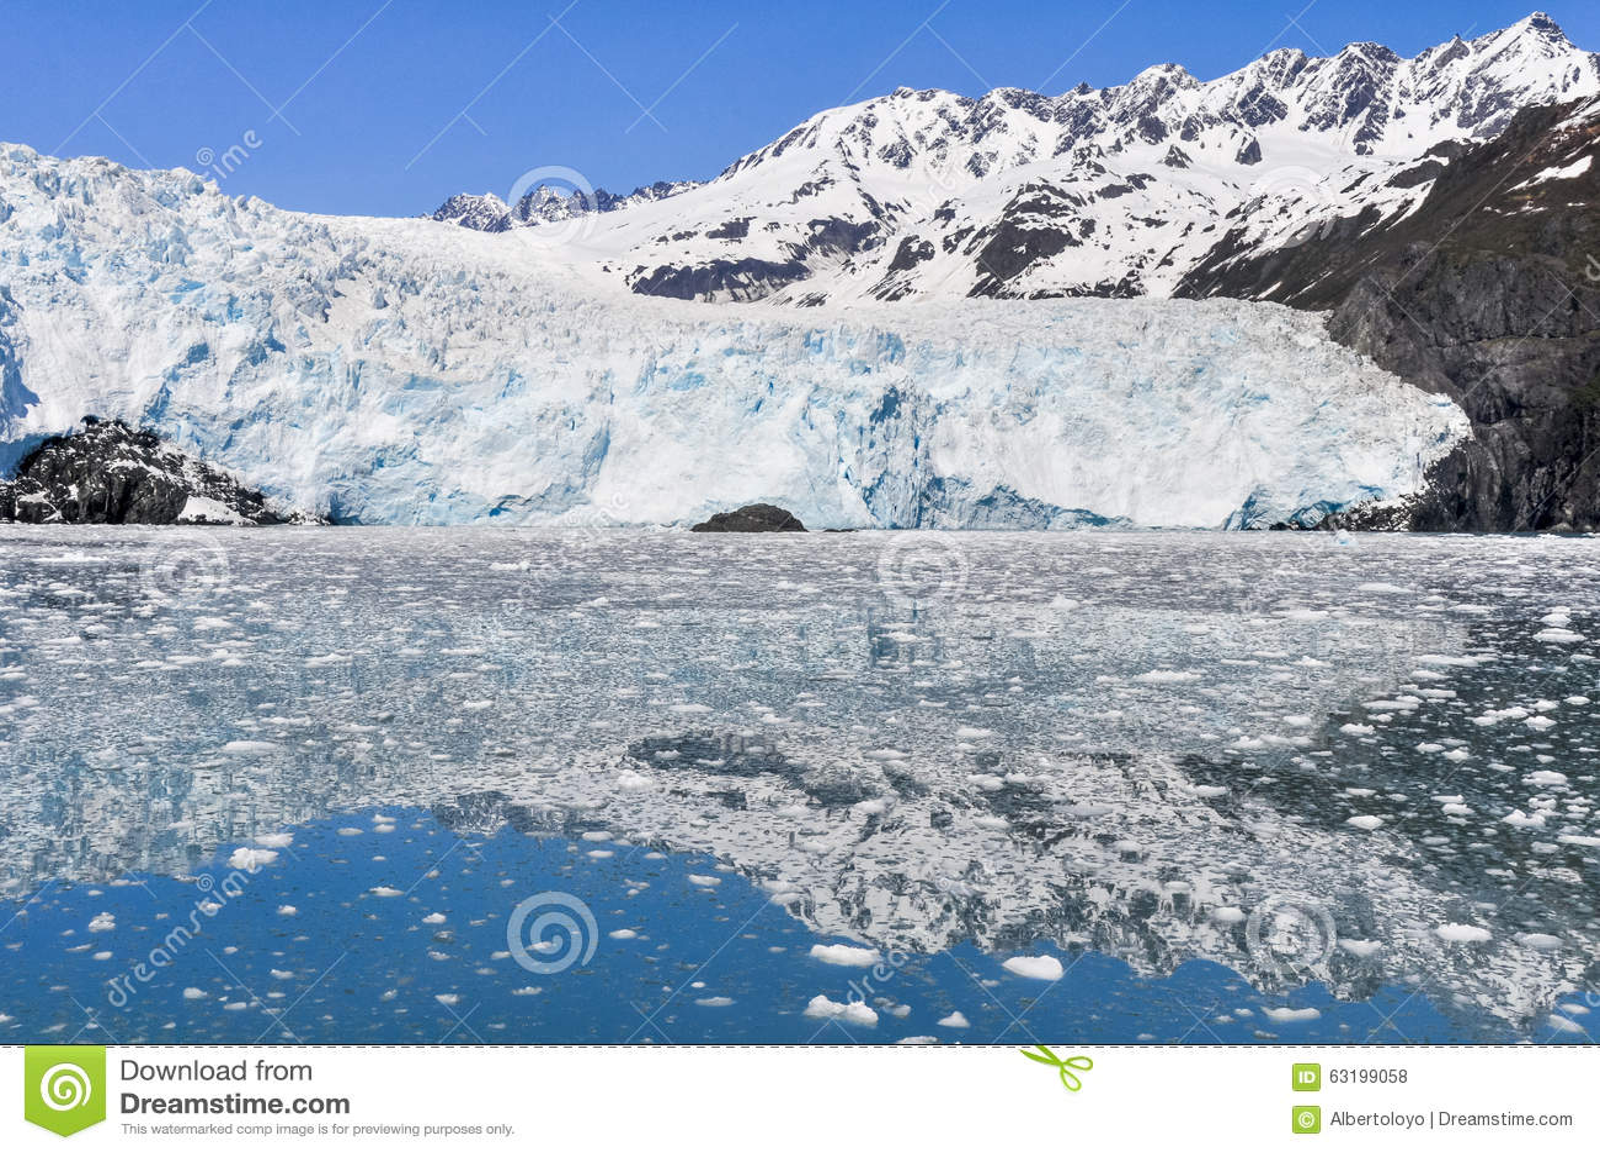 Kenai (AK) United States  city images : Aialik Glacier, Kenai Fjords National Park Alaska Stock Photo ...